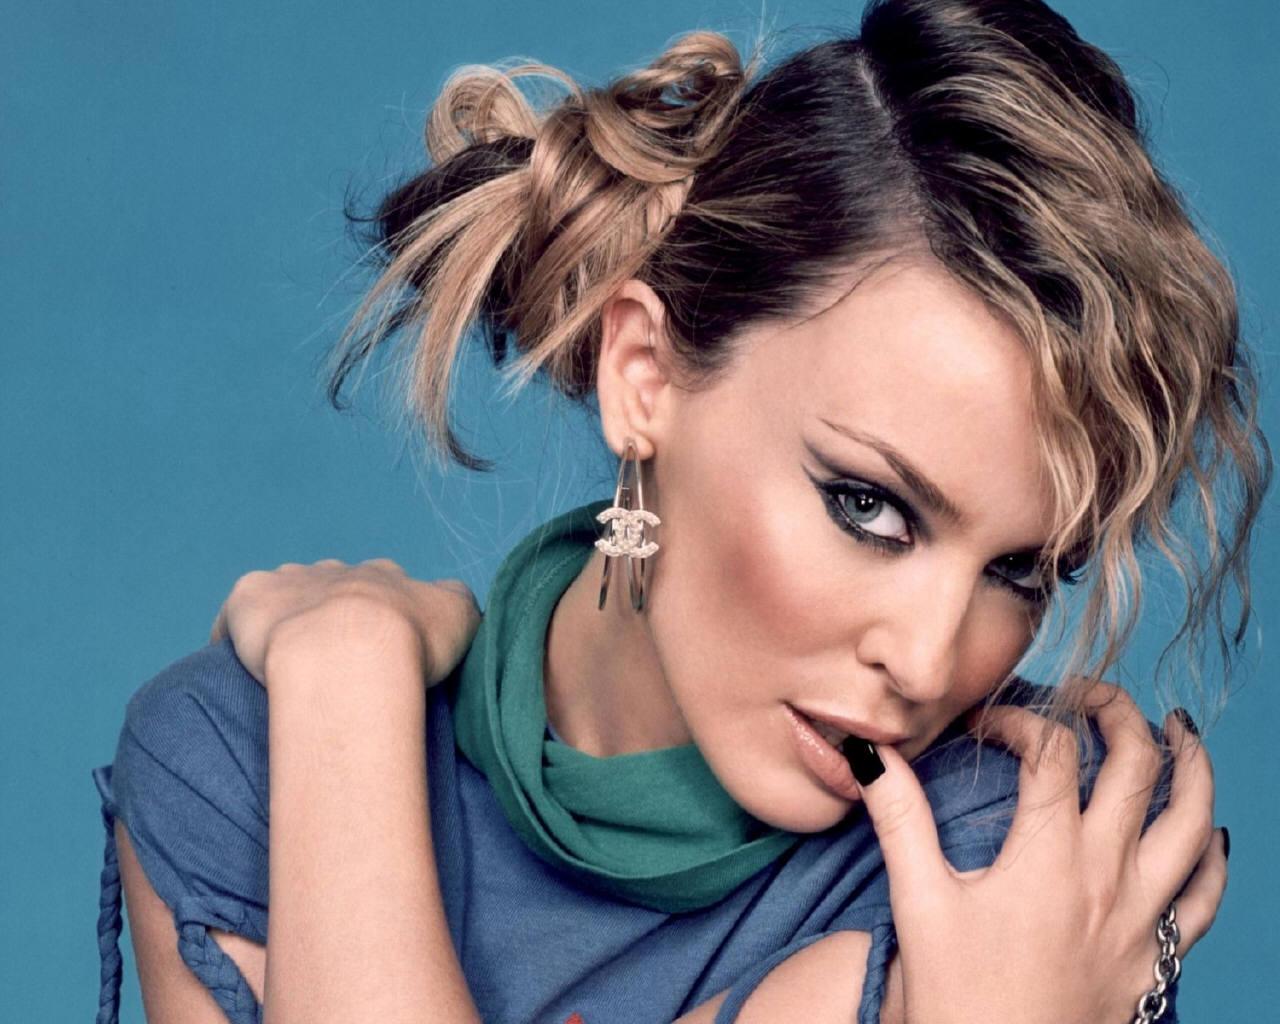 http://images.fanpop.com/images/image_uploads/Kylie-Minogue-kylie-minogue-64557_1280_1024.jpg